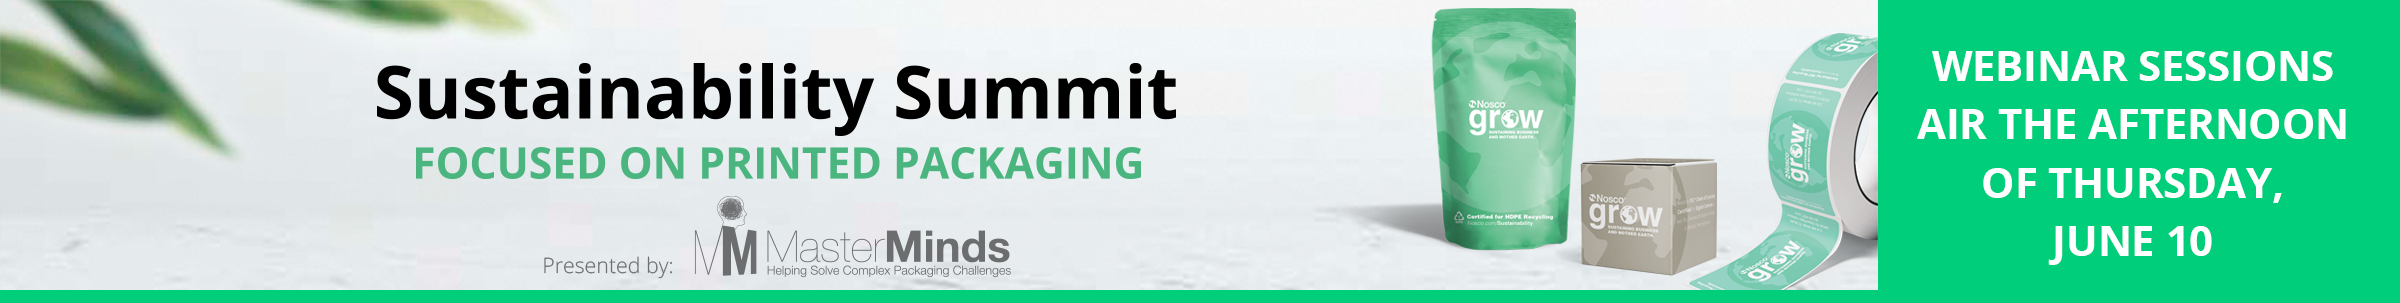 Sustainability Summit EmailHeader-New-1